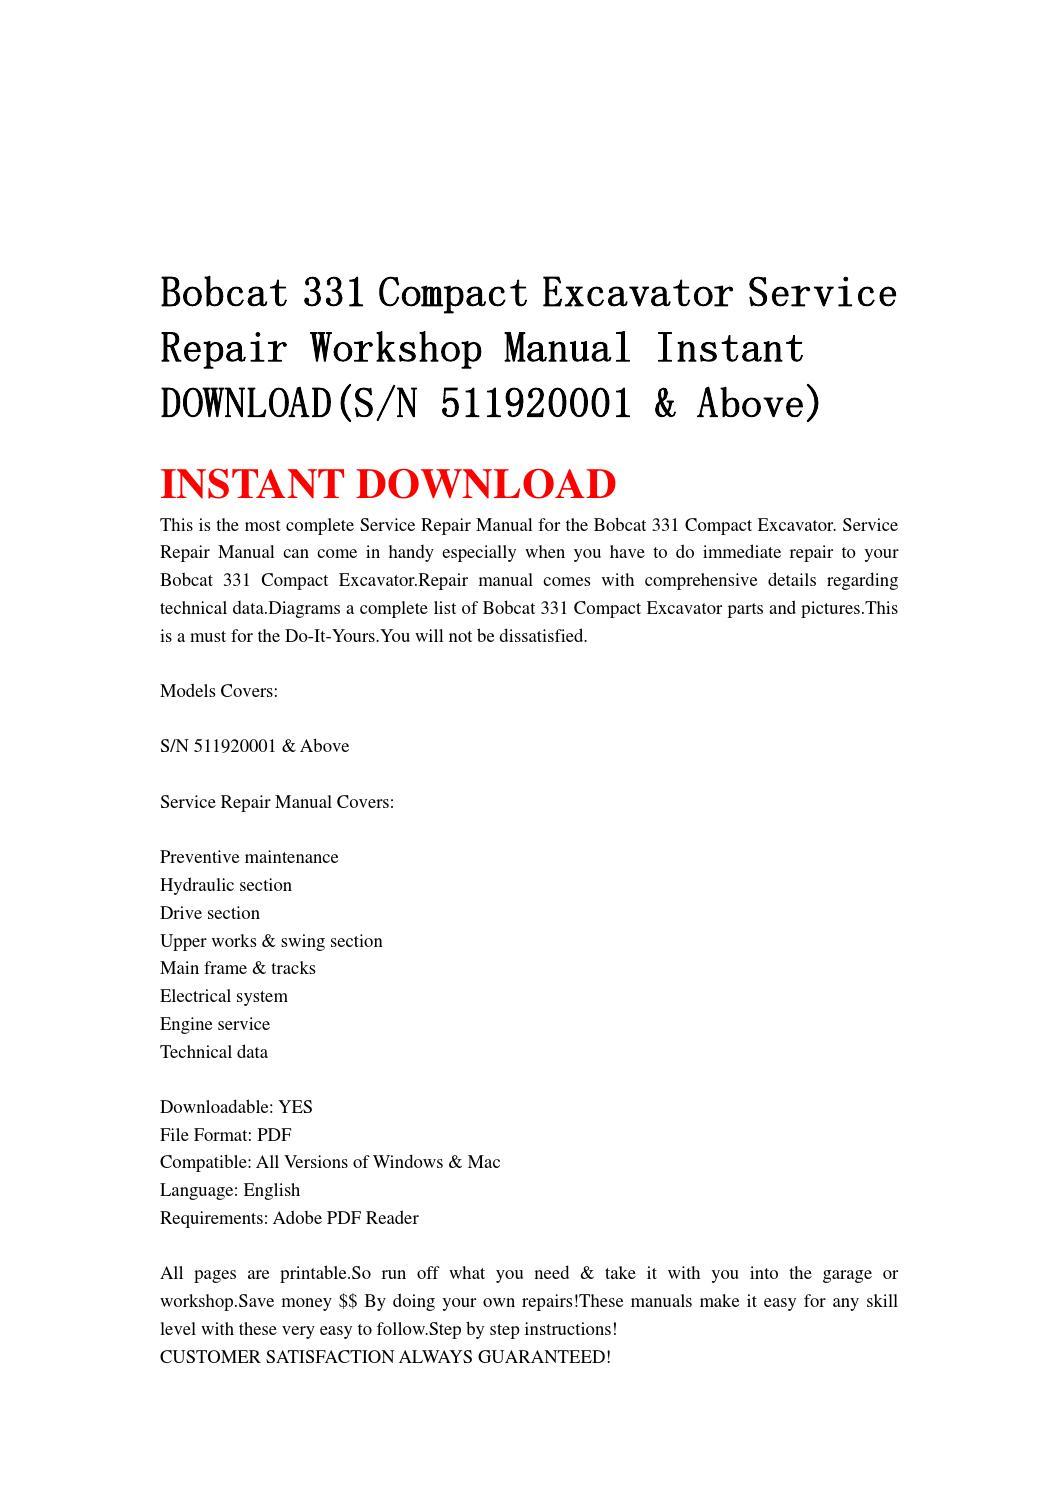 Bobcat 331 Compact Excavator Service Repair Workshop